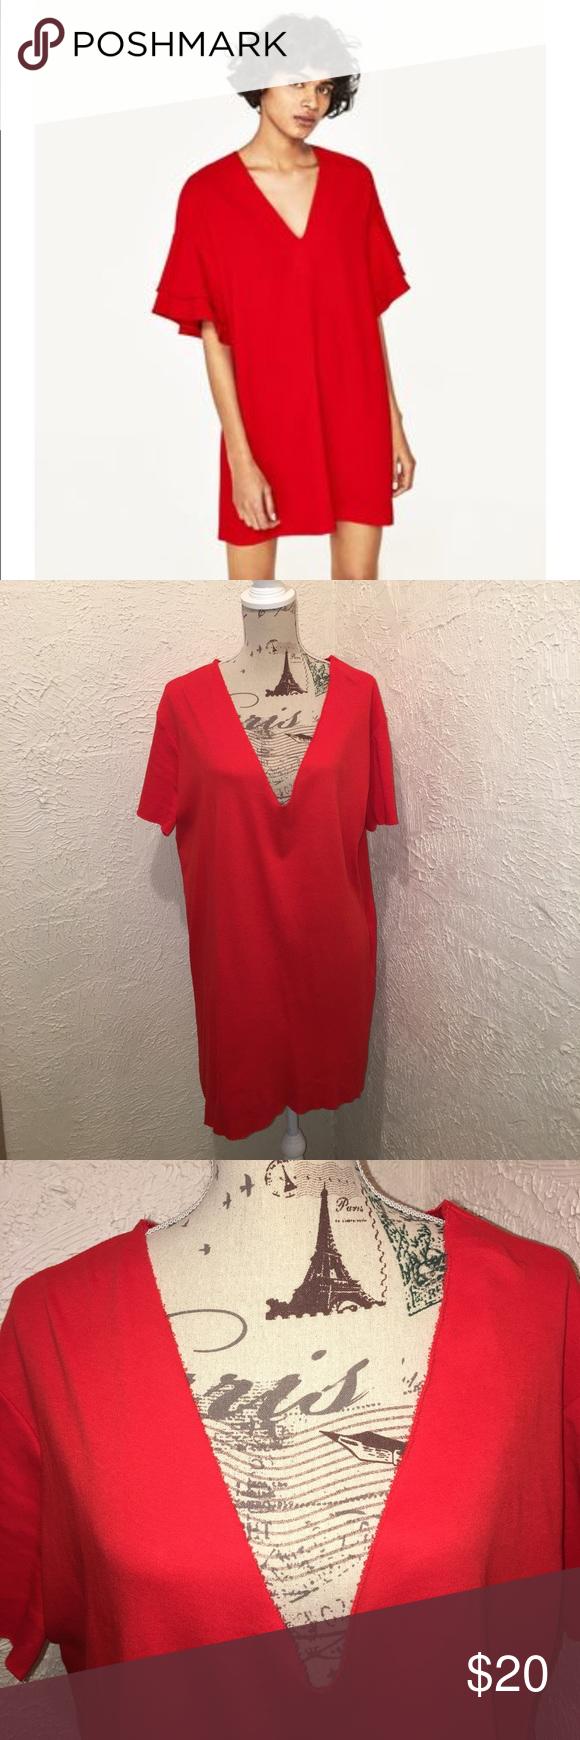 Zara red jersey dress size large